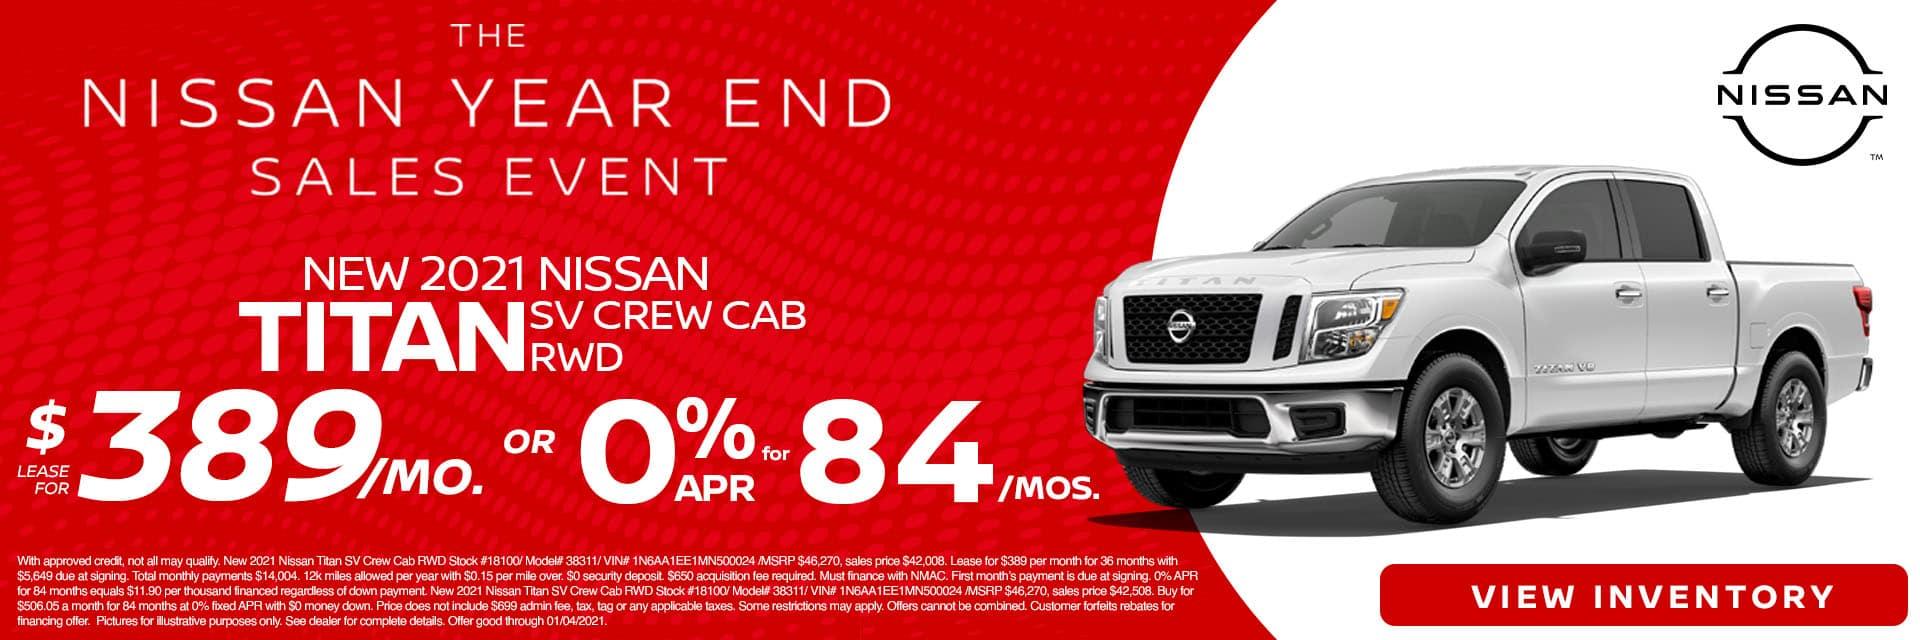 CNSN-December 2020-2020 Nissan Titan